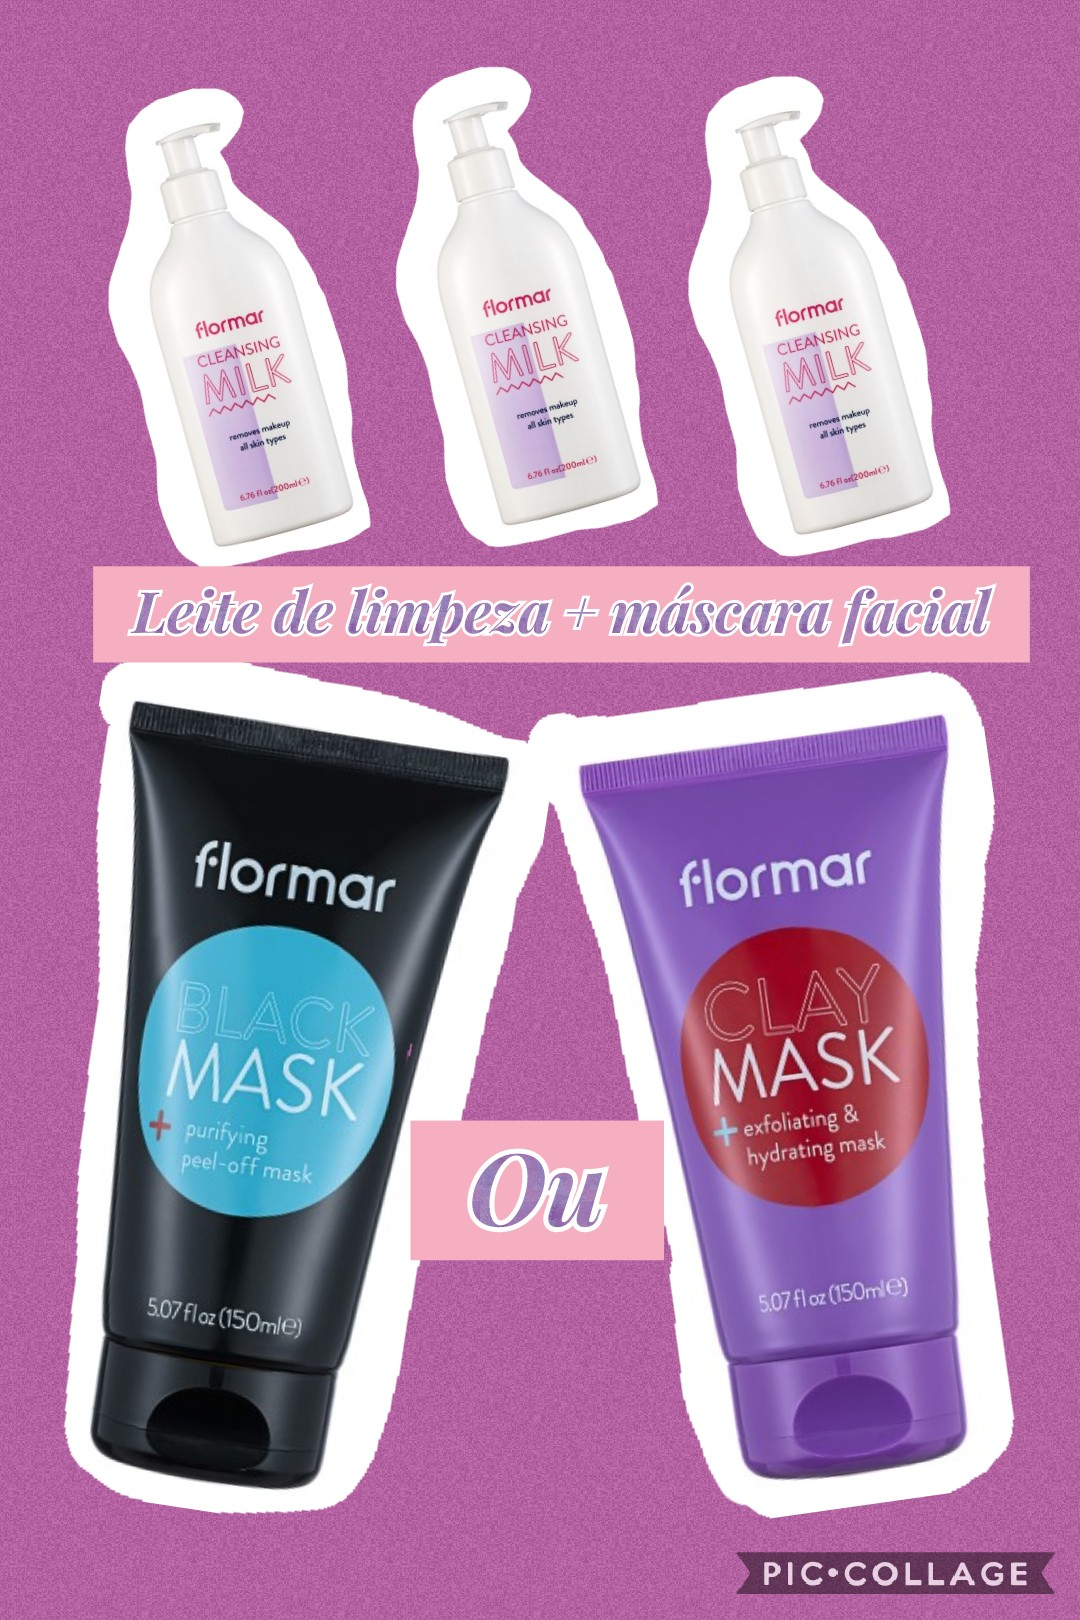 Conjunto limpeza de pele FLORMAR - CLEANSING MILK + MÁSCARA